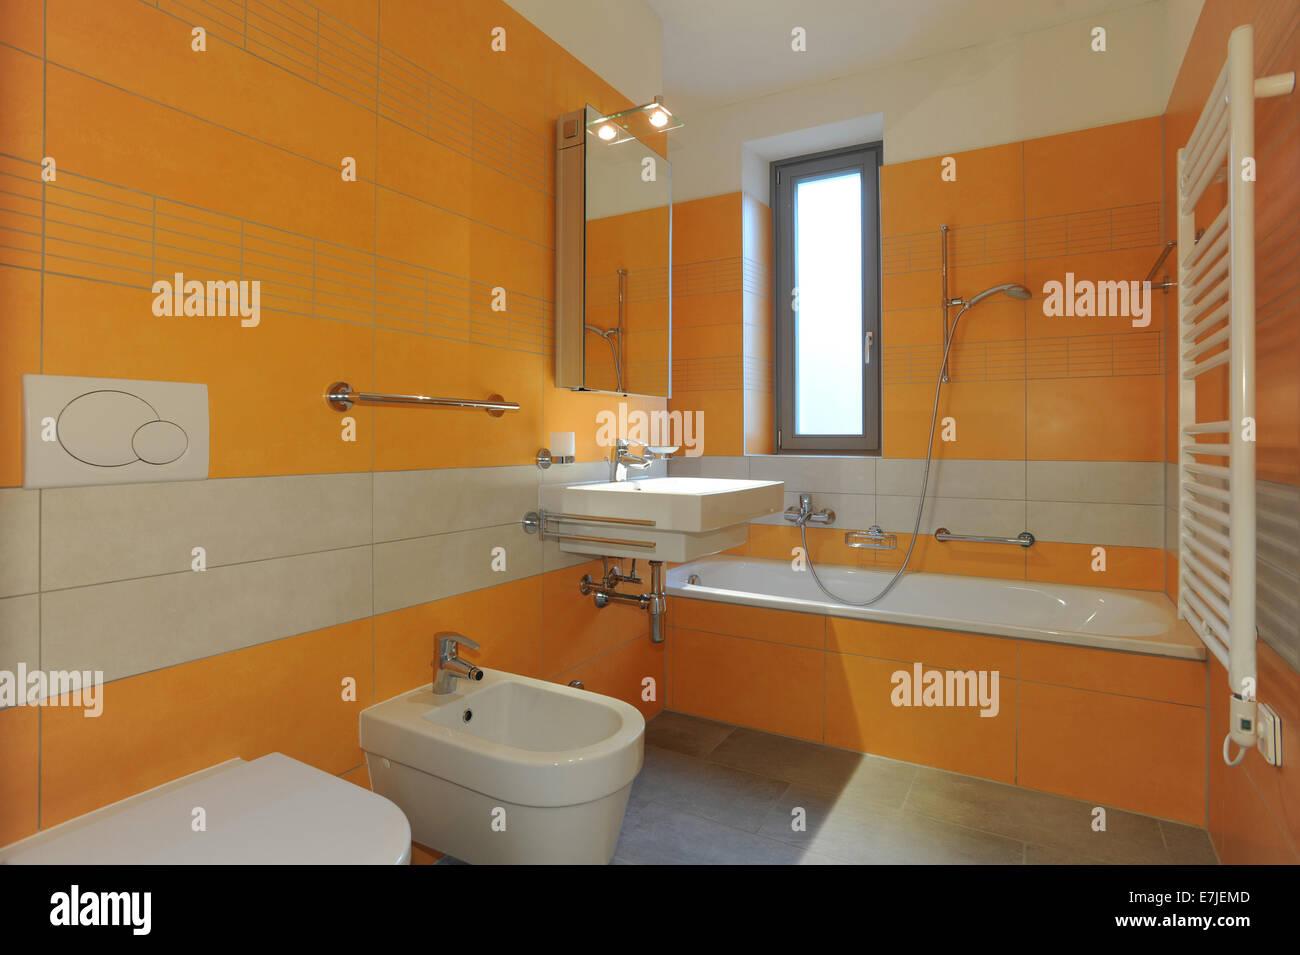 Apartment architectural architecture bath bathroom decorative luxury nobody real stone walls wc window orange